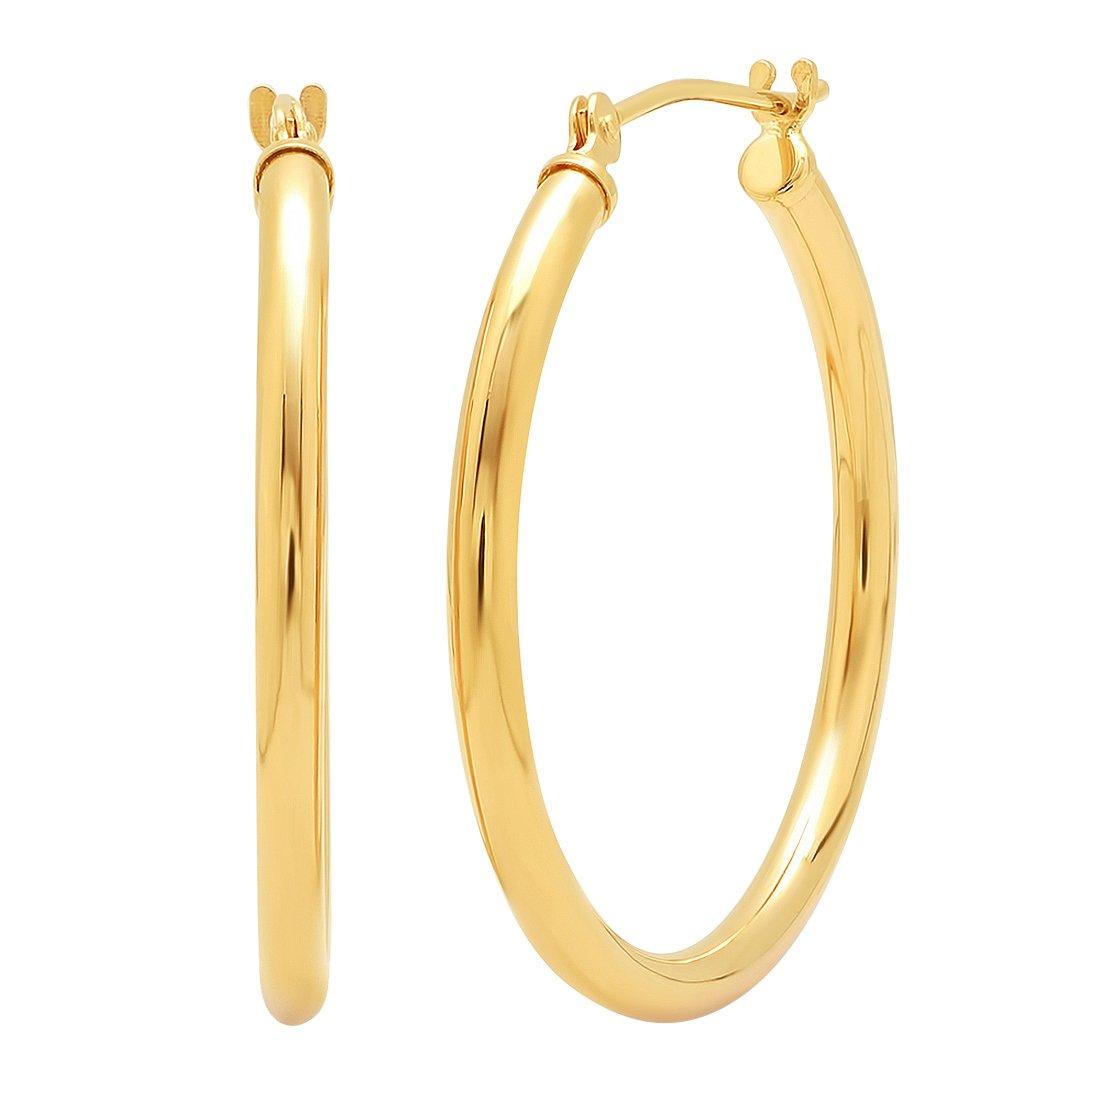 14K Yellow Gold 1 inch Round Hoop Earrings